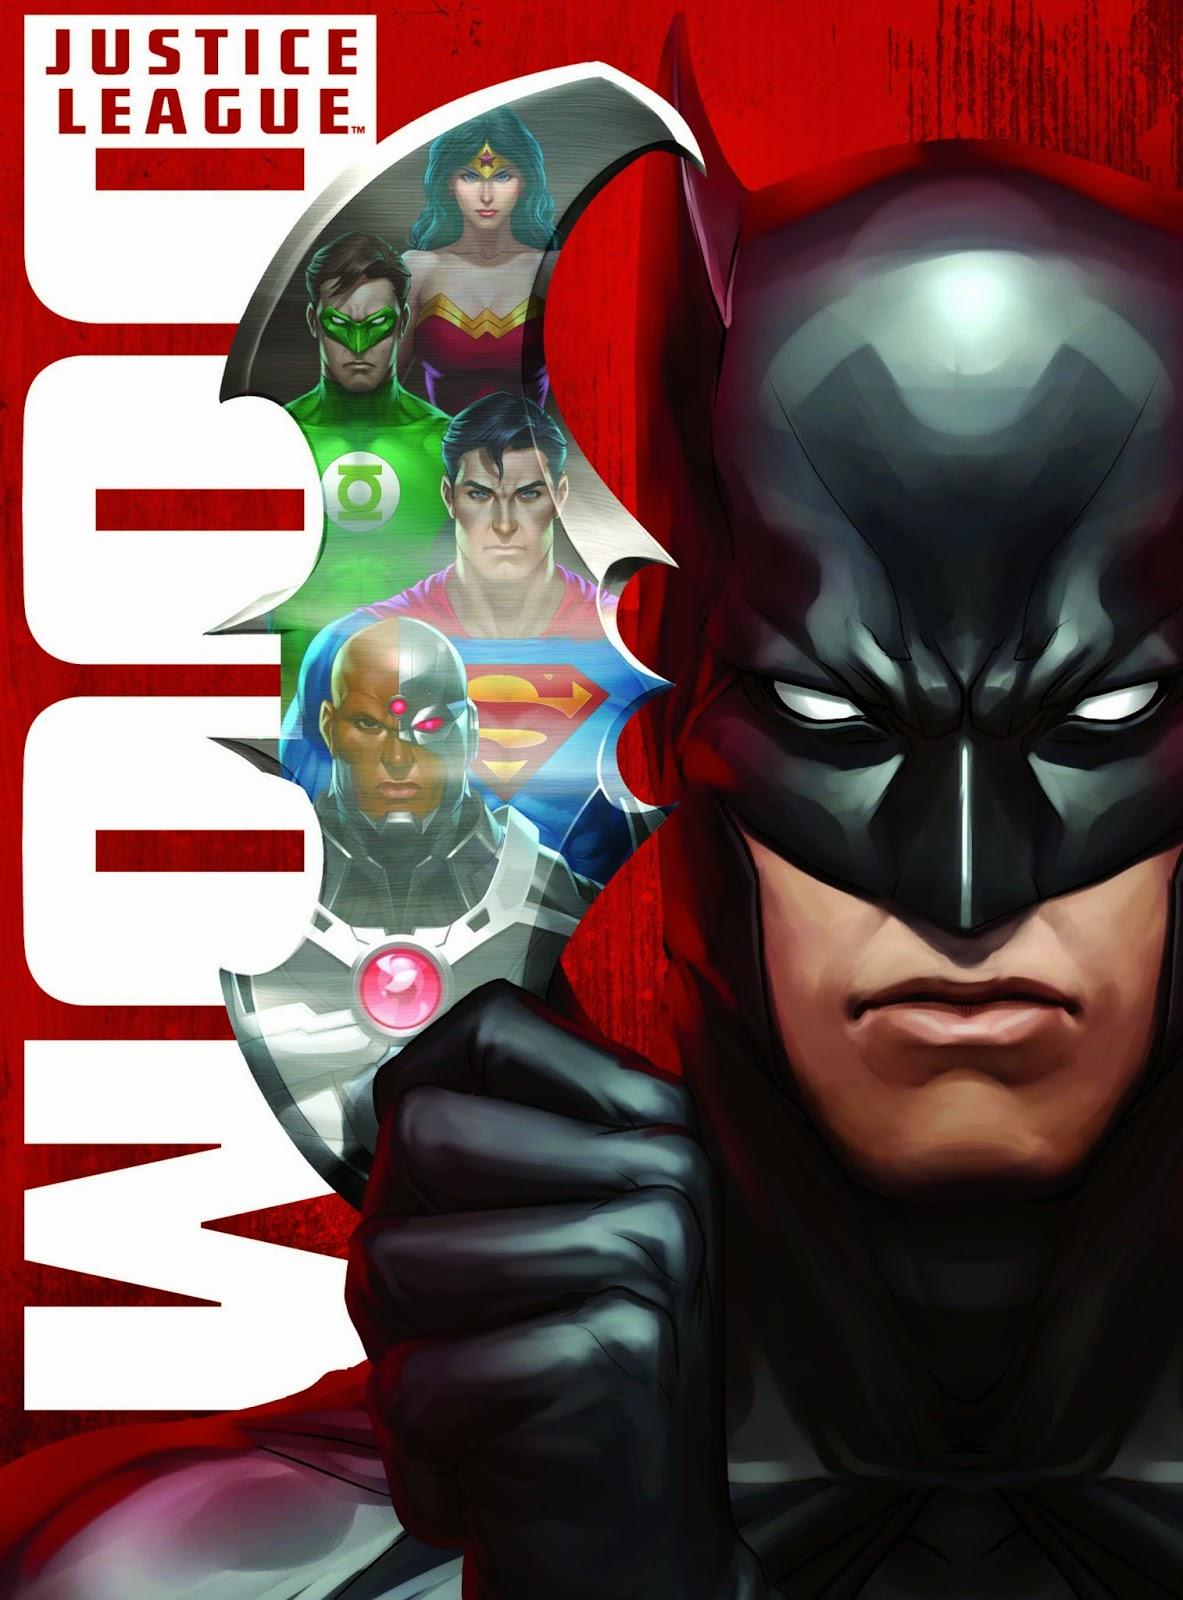 Justice League: Doom จัสติซ ลีก ศึกพิฆาตซูเปอร์ฮีโร่ [HD][พากย์ไทย]